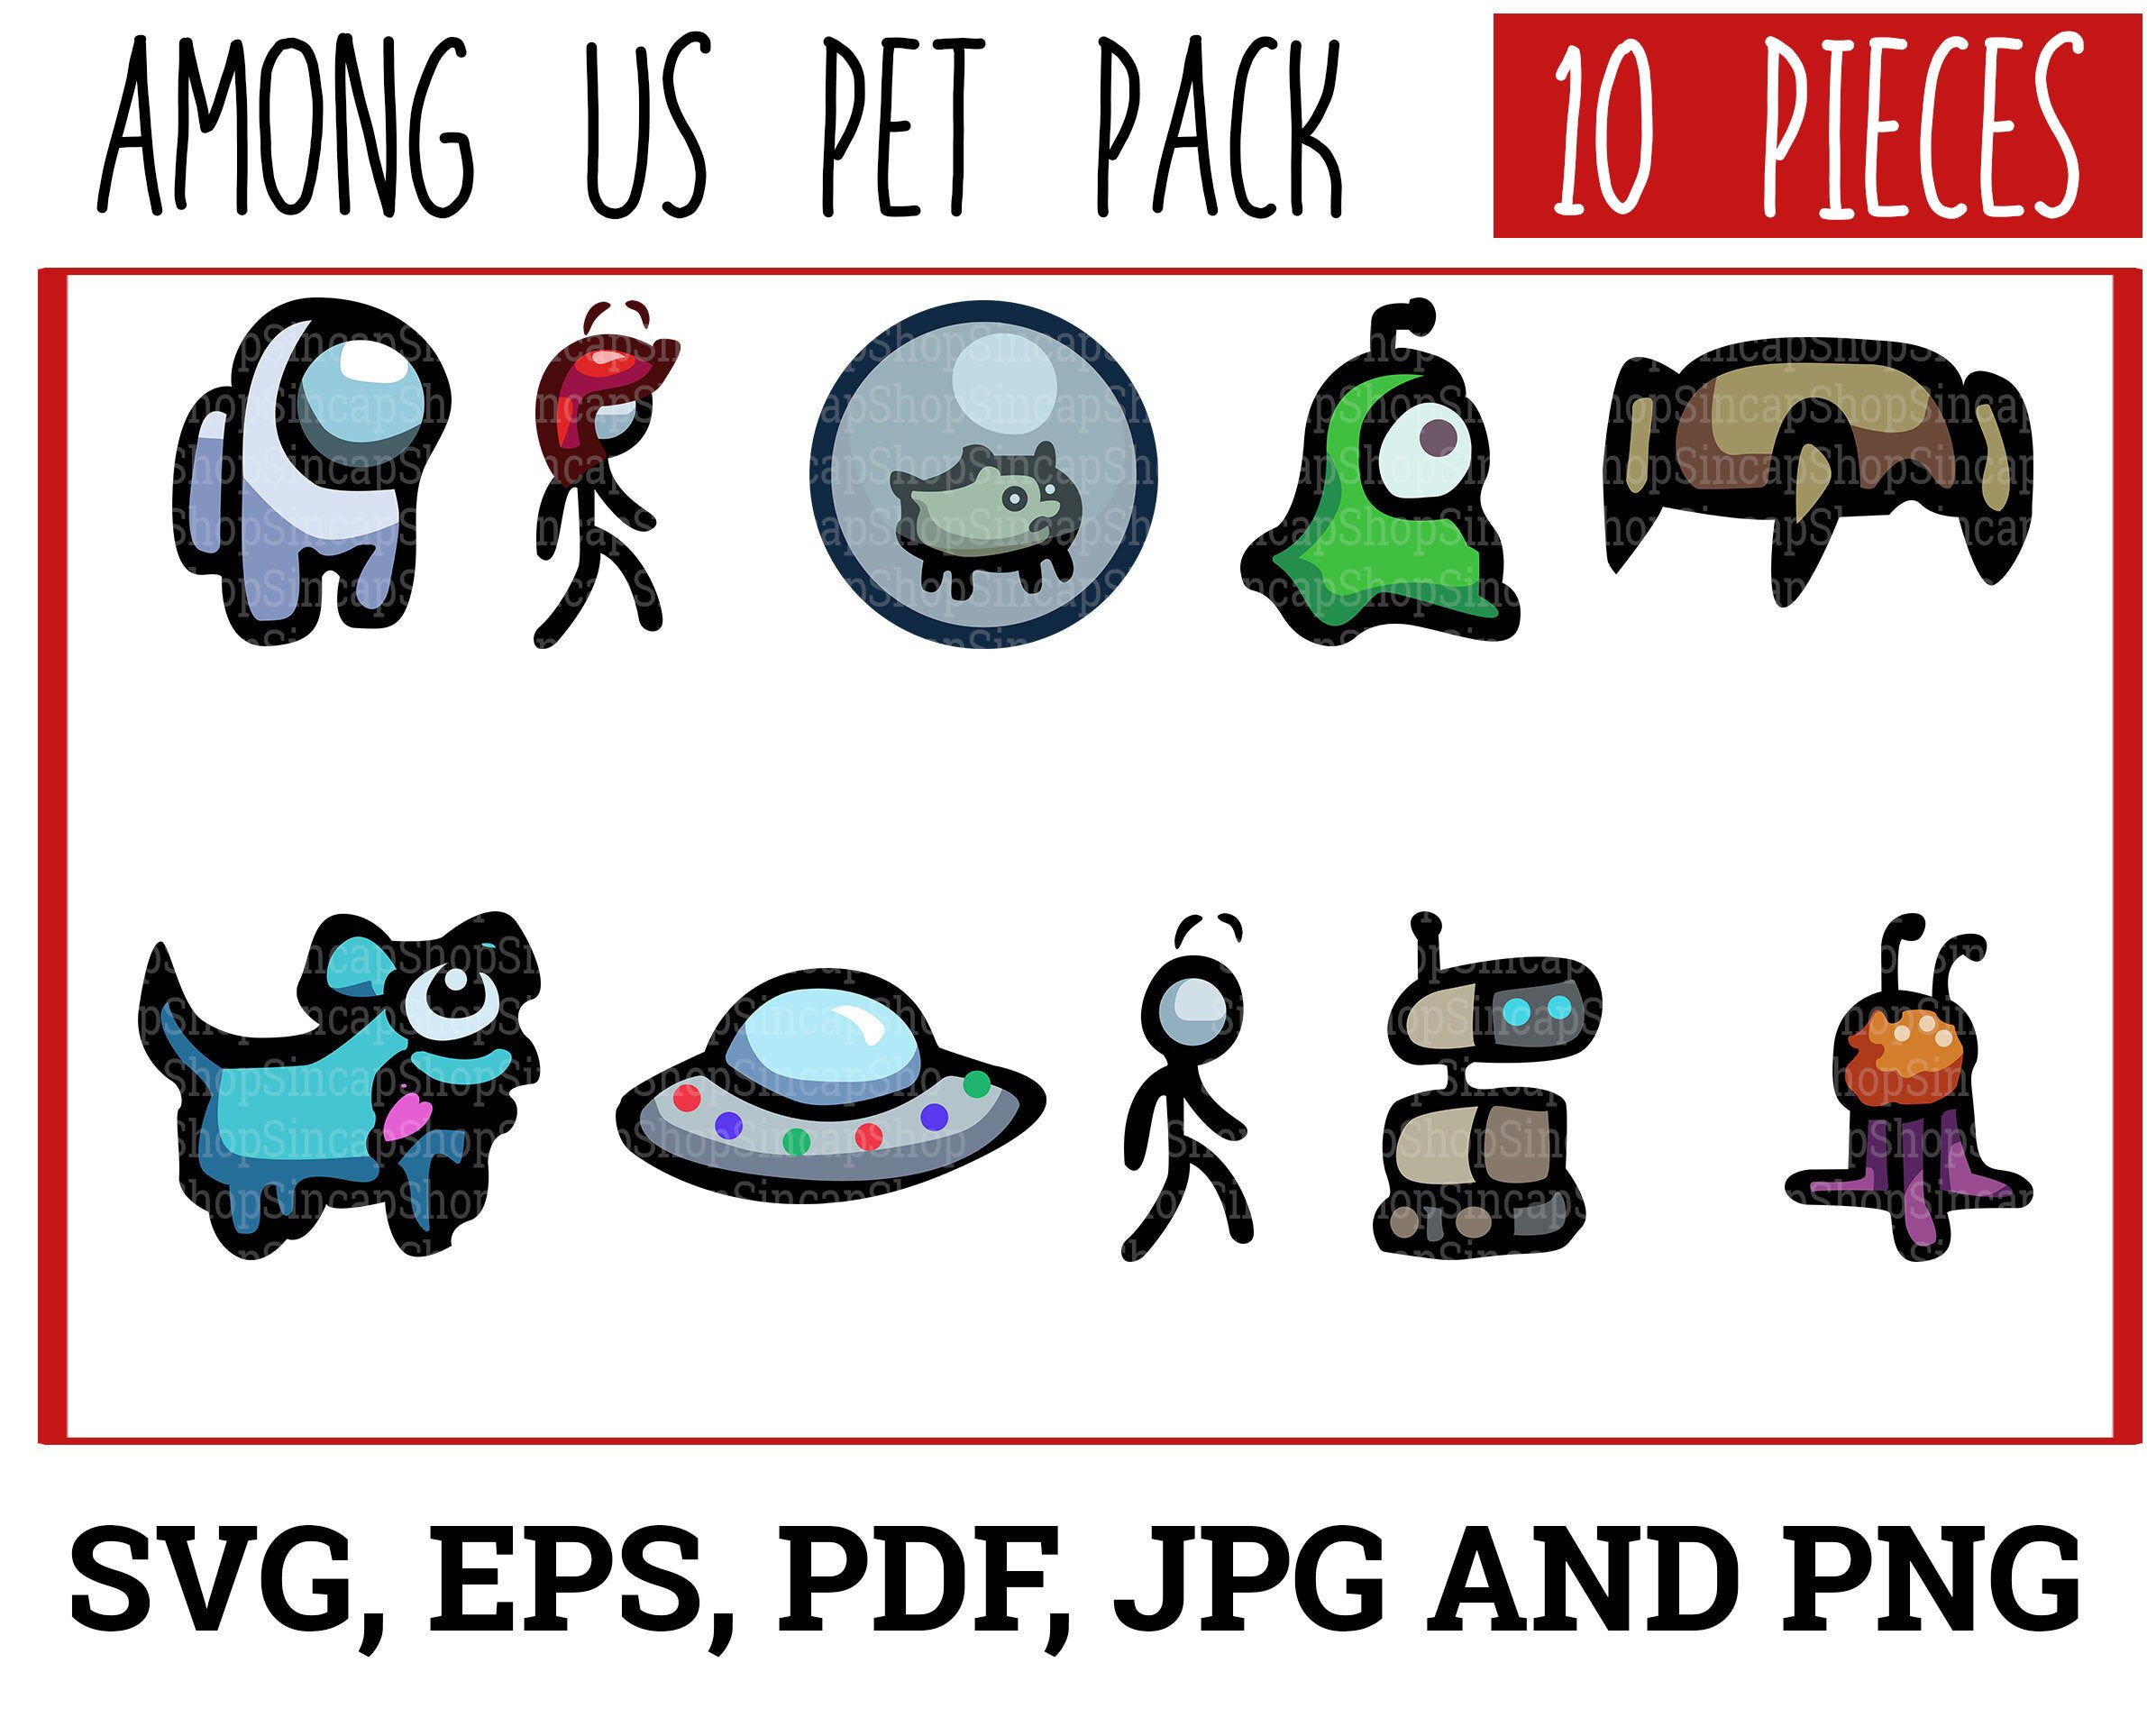 Among Us Svg Pet Pack Among Us Svg Among Us Png Among Us Etsy Pets Svg Png